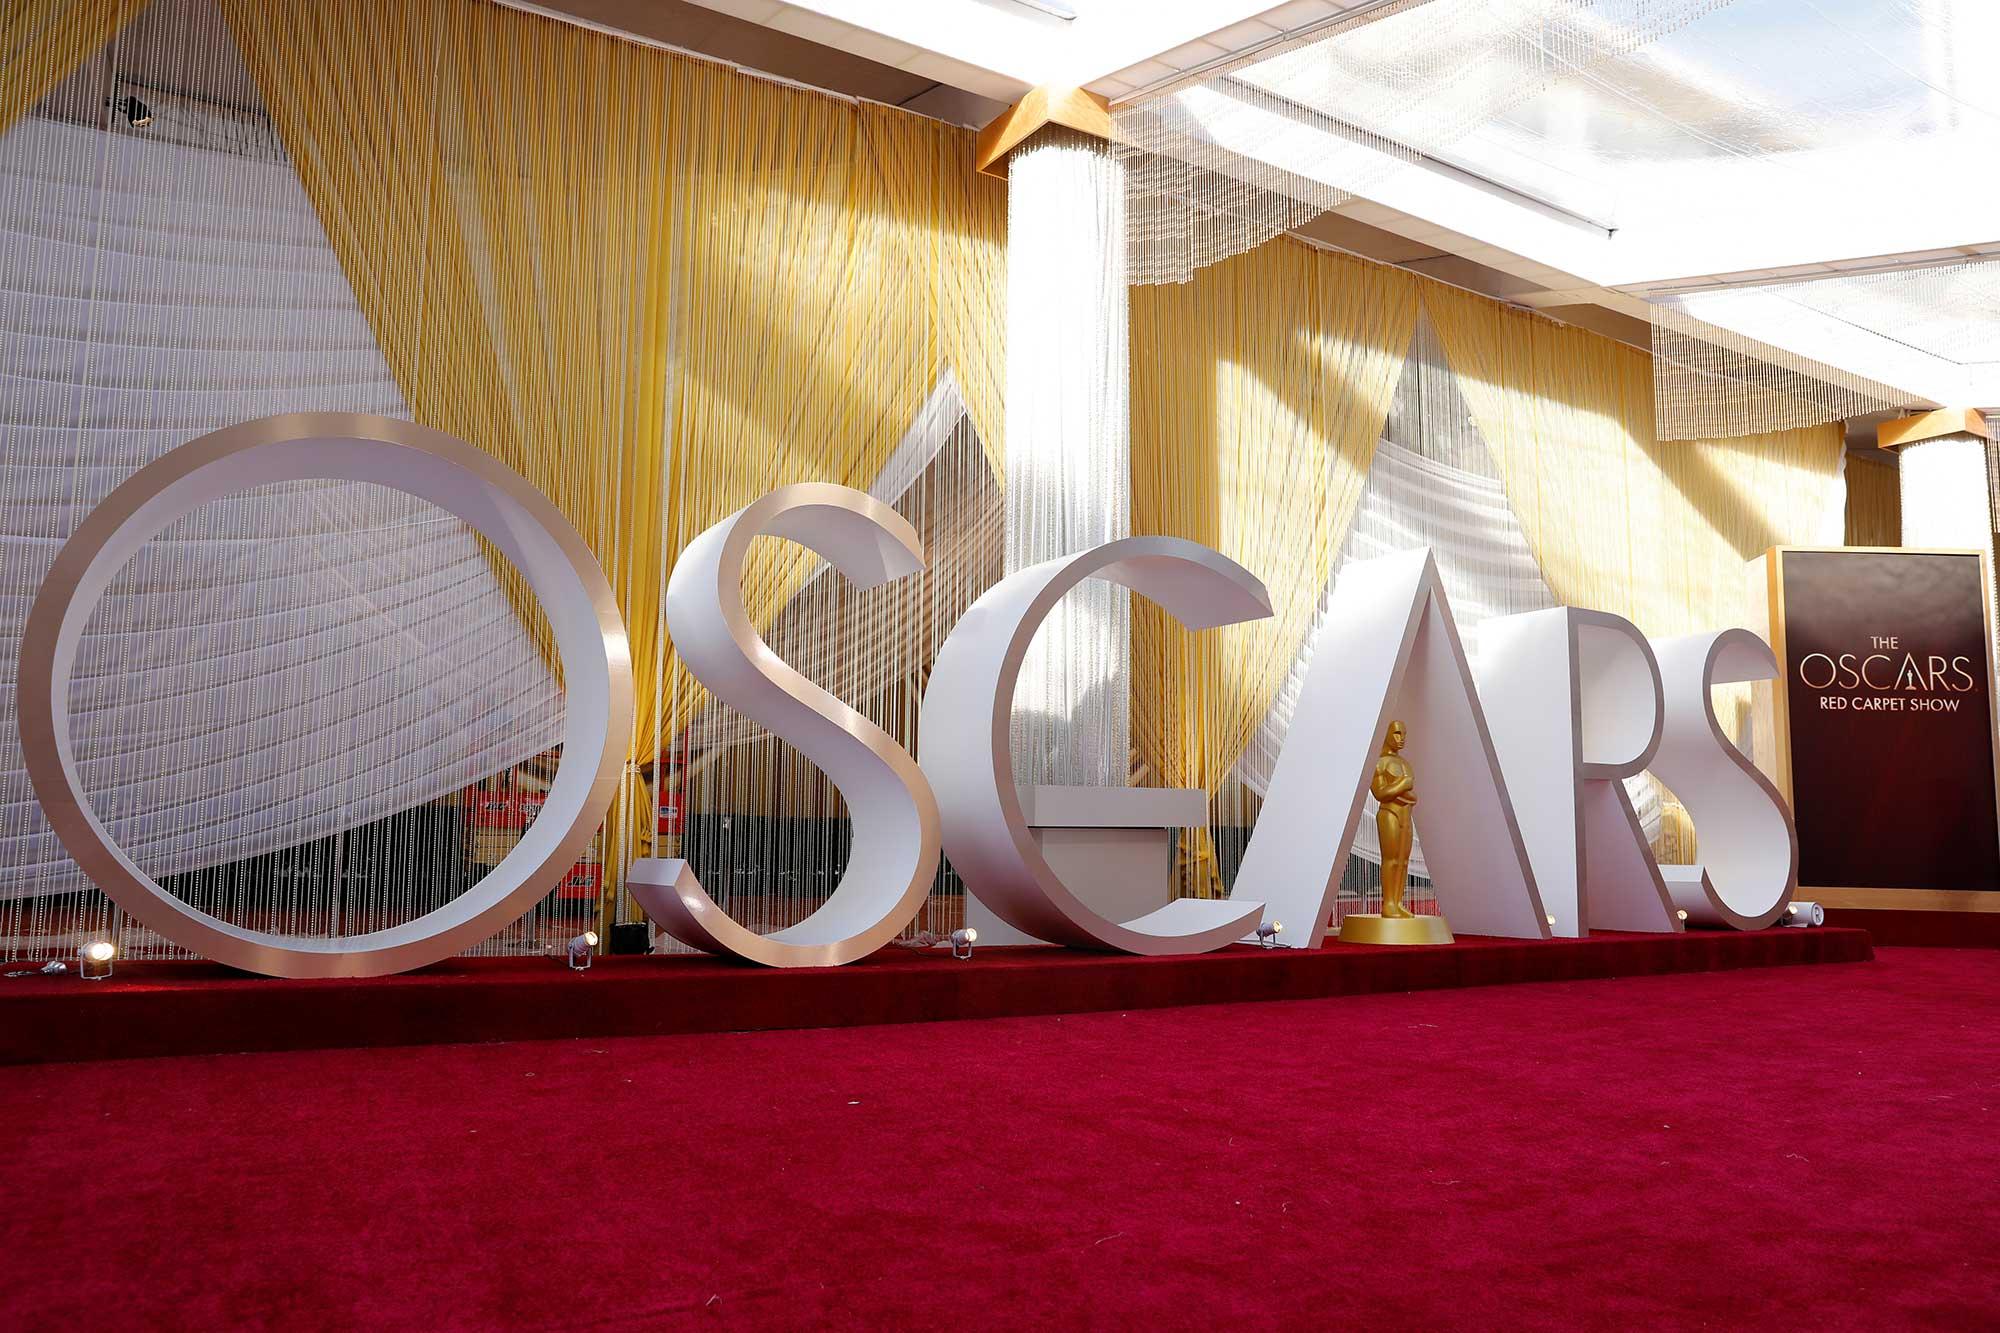 PODCAST – Wednesday, April 21: Eyewitness Stories From Branford; Oscars Talk